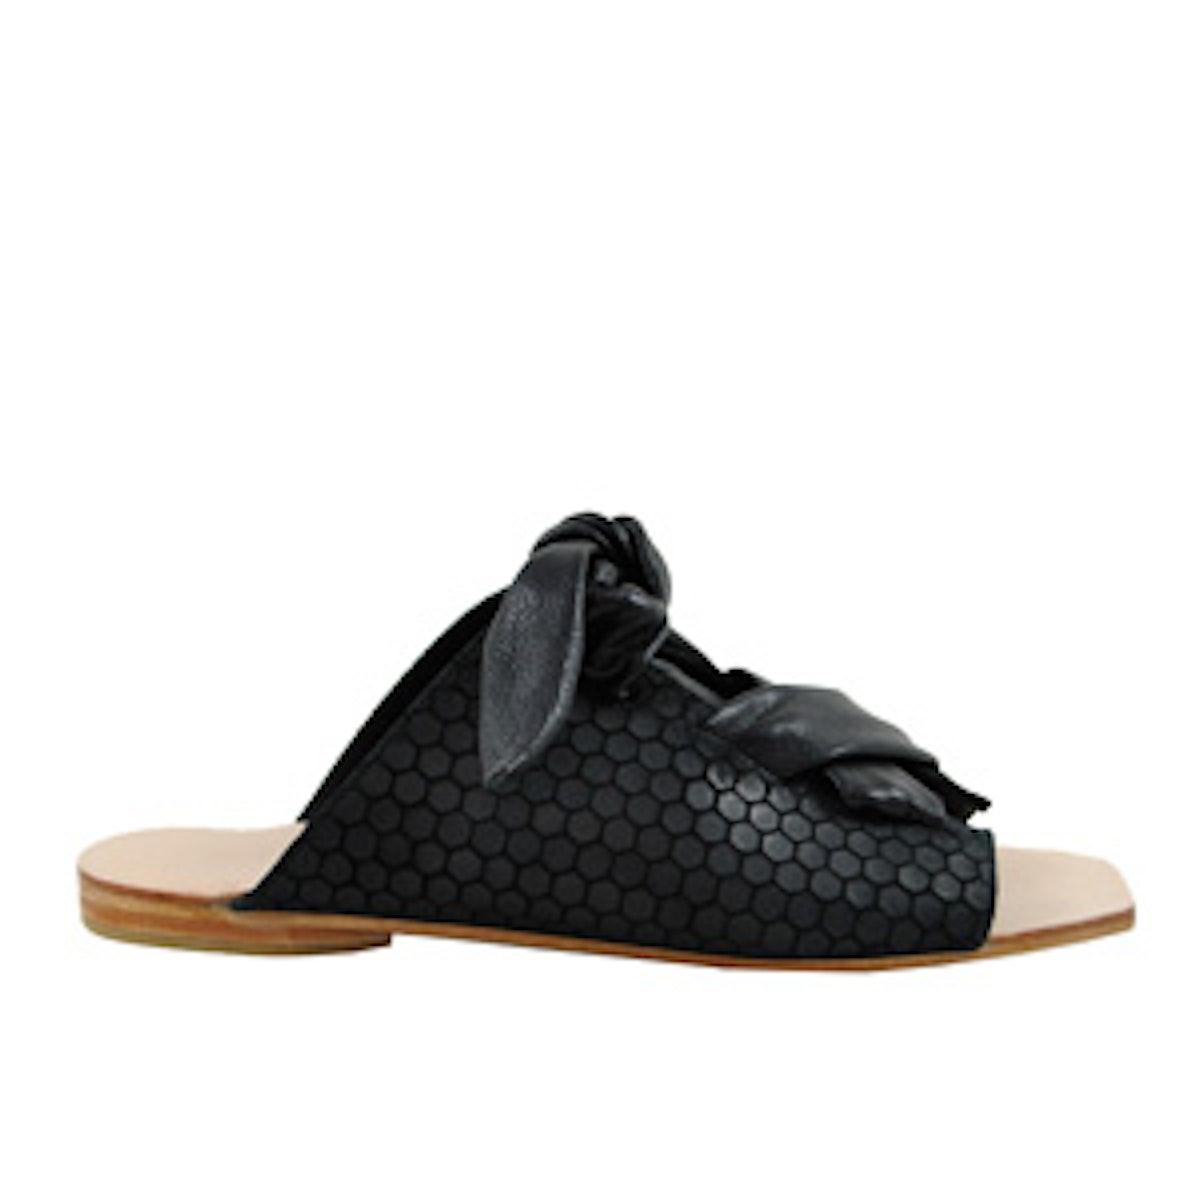 Texo Sandal